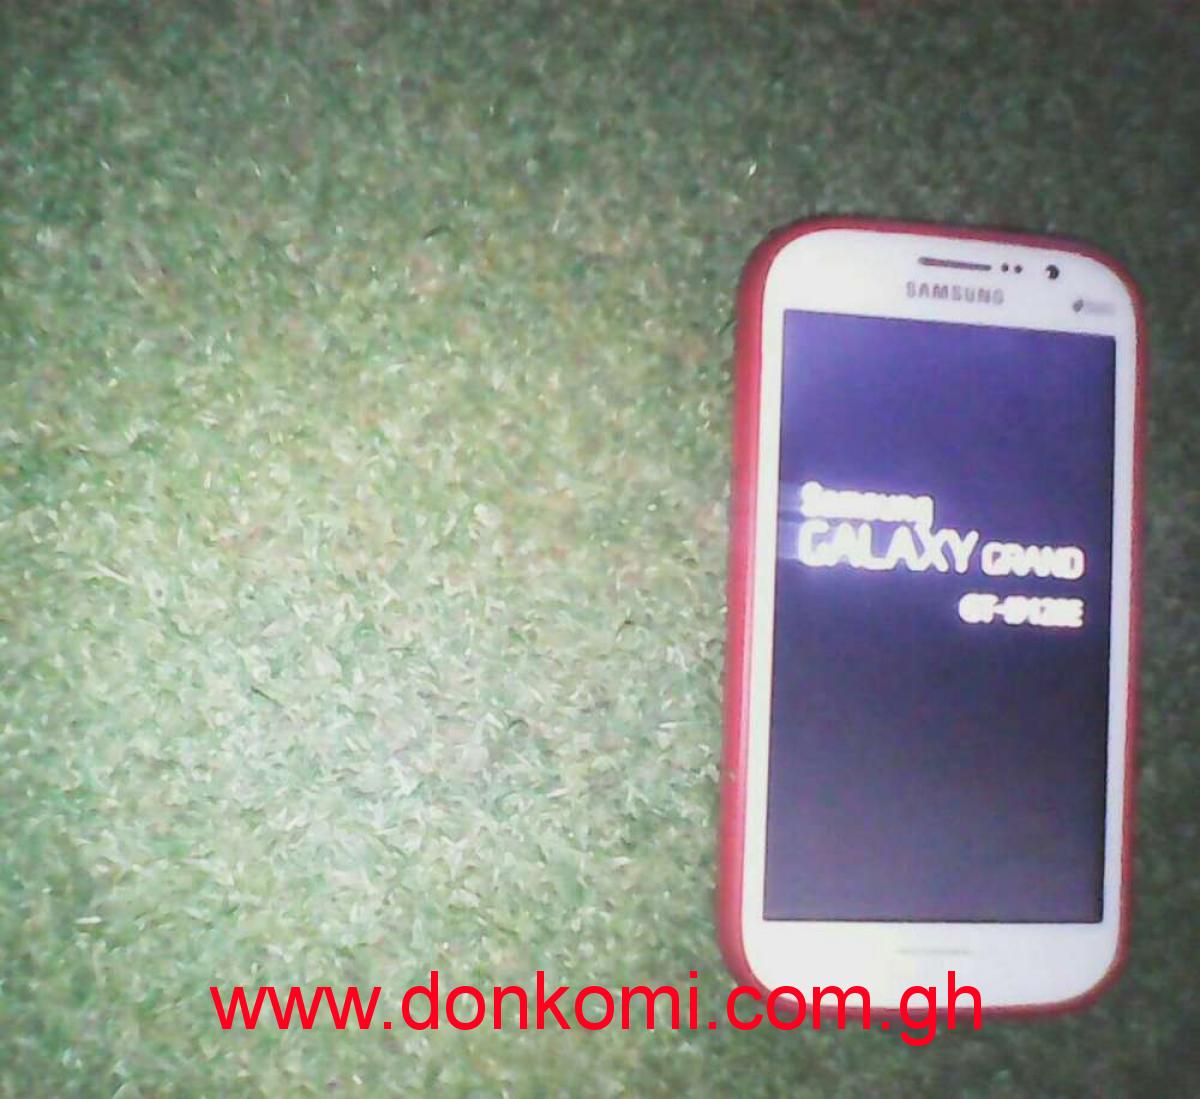 Samsung Galaxy Grand for sale